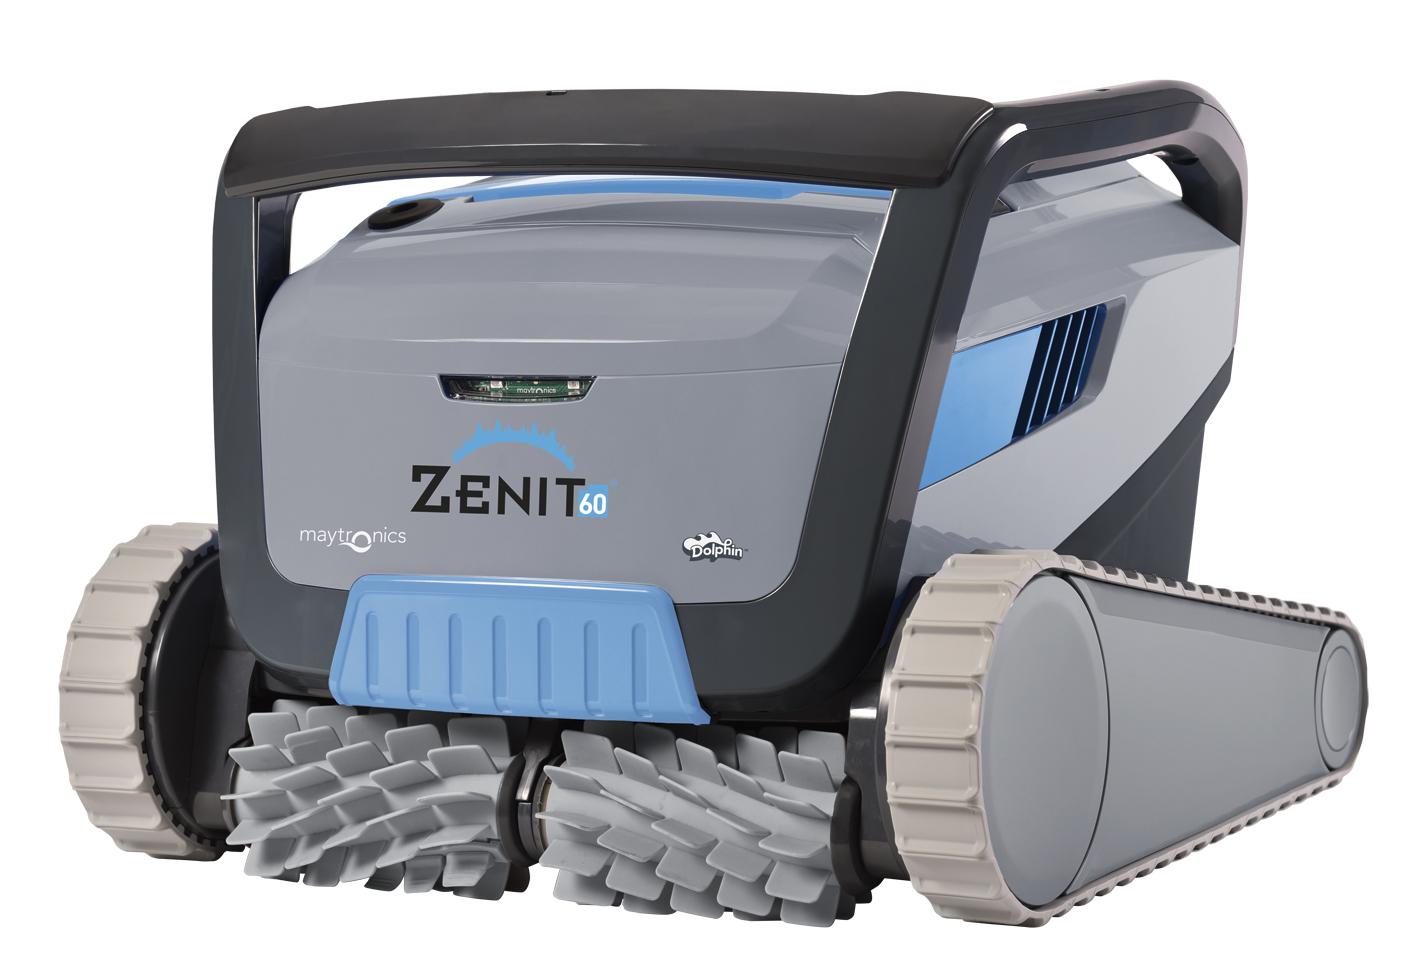 Robot Dolphin Zenit 60 | MAYTRONICS